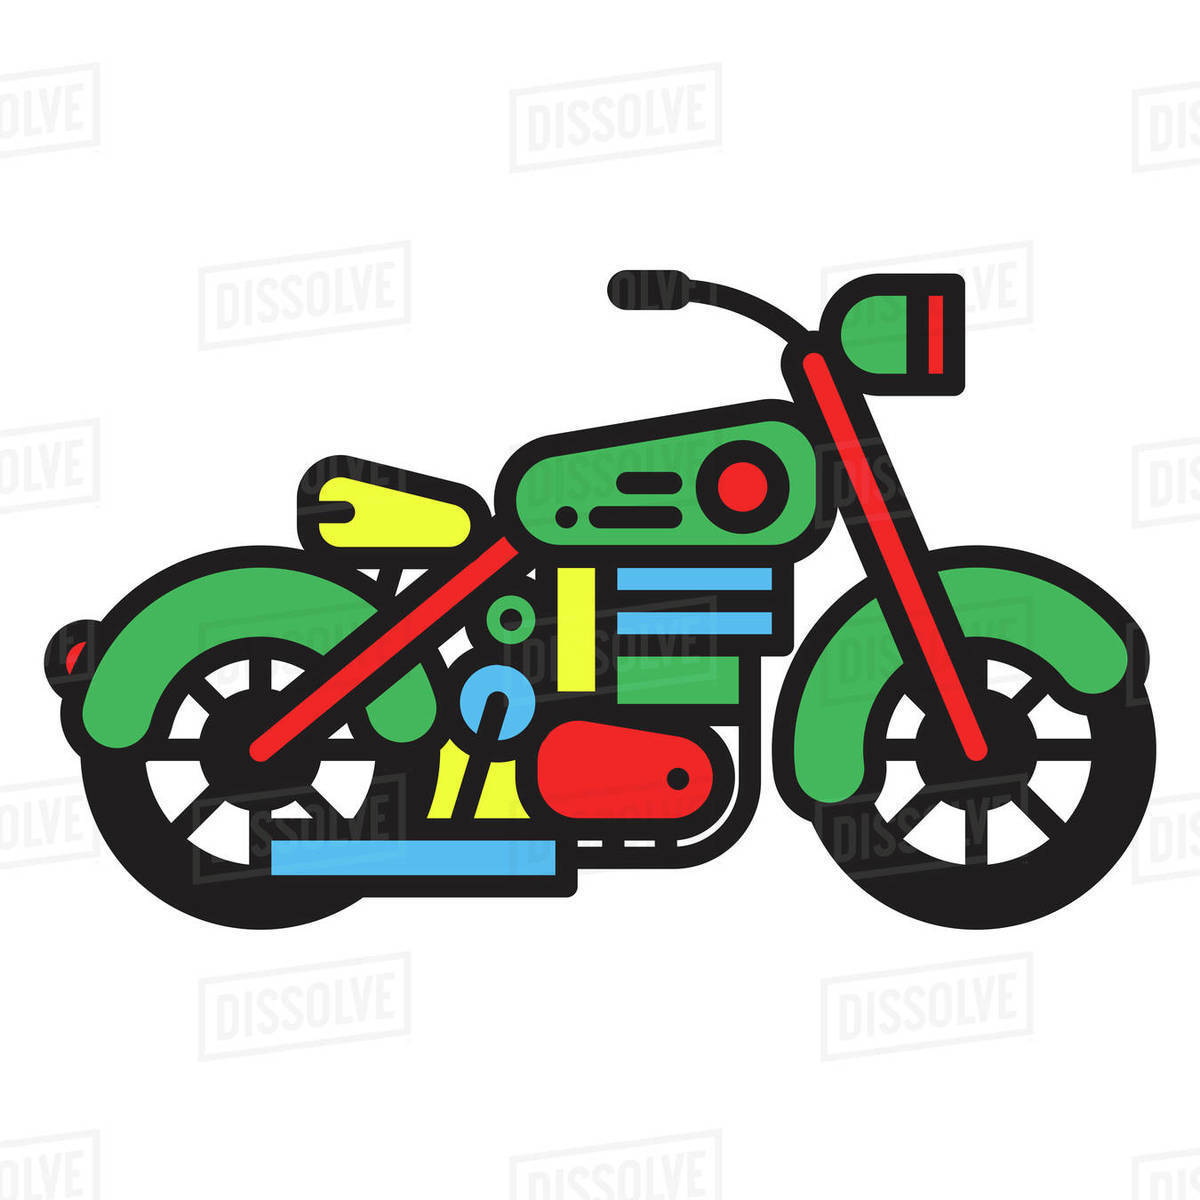 Illustration of a motorbike against white background Royalty-free stock photo